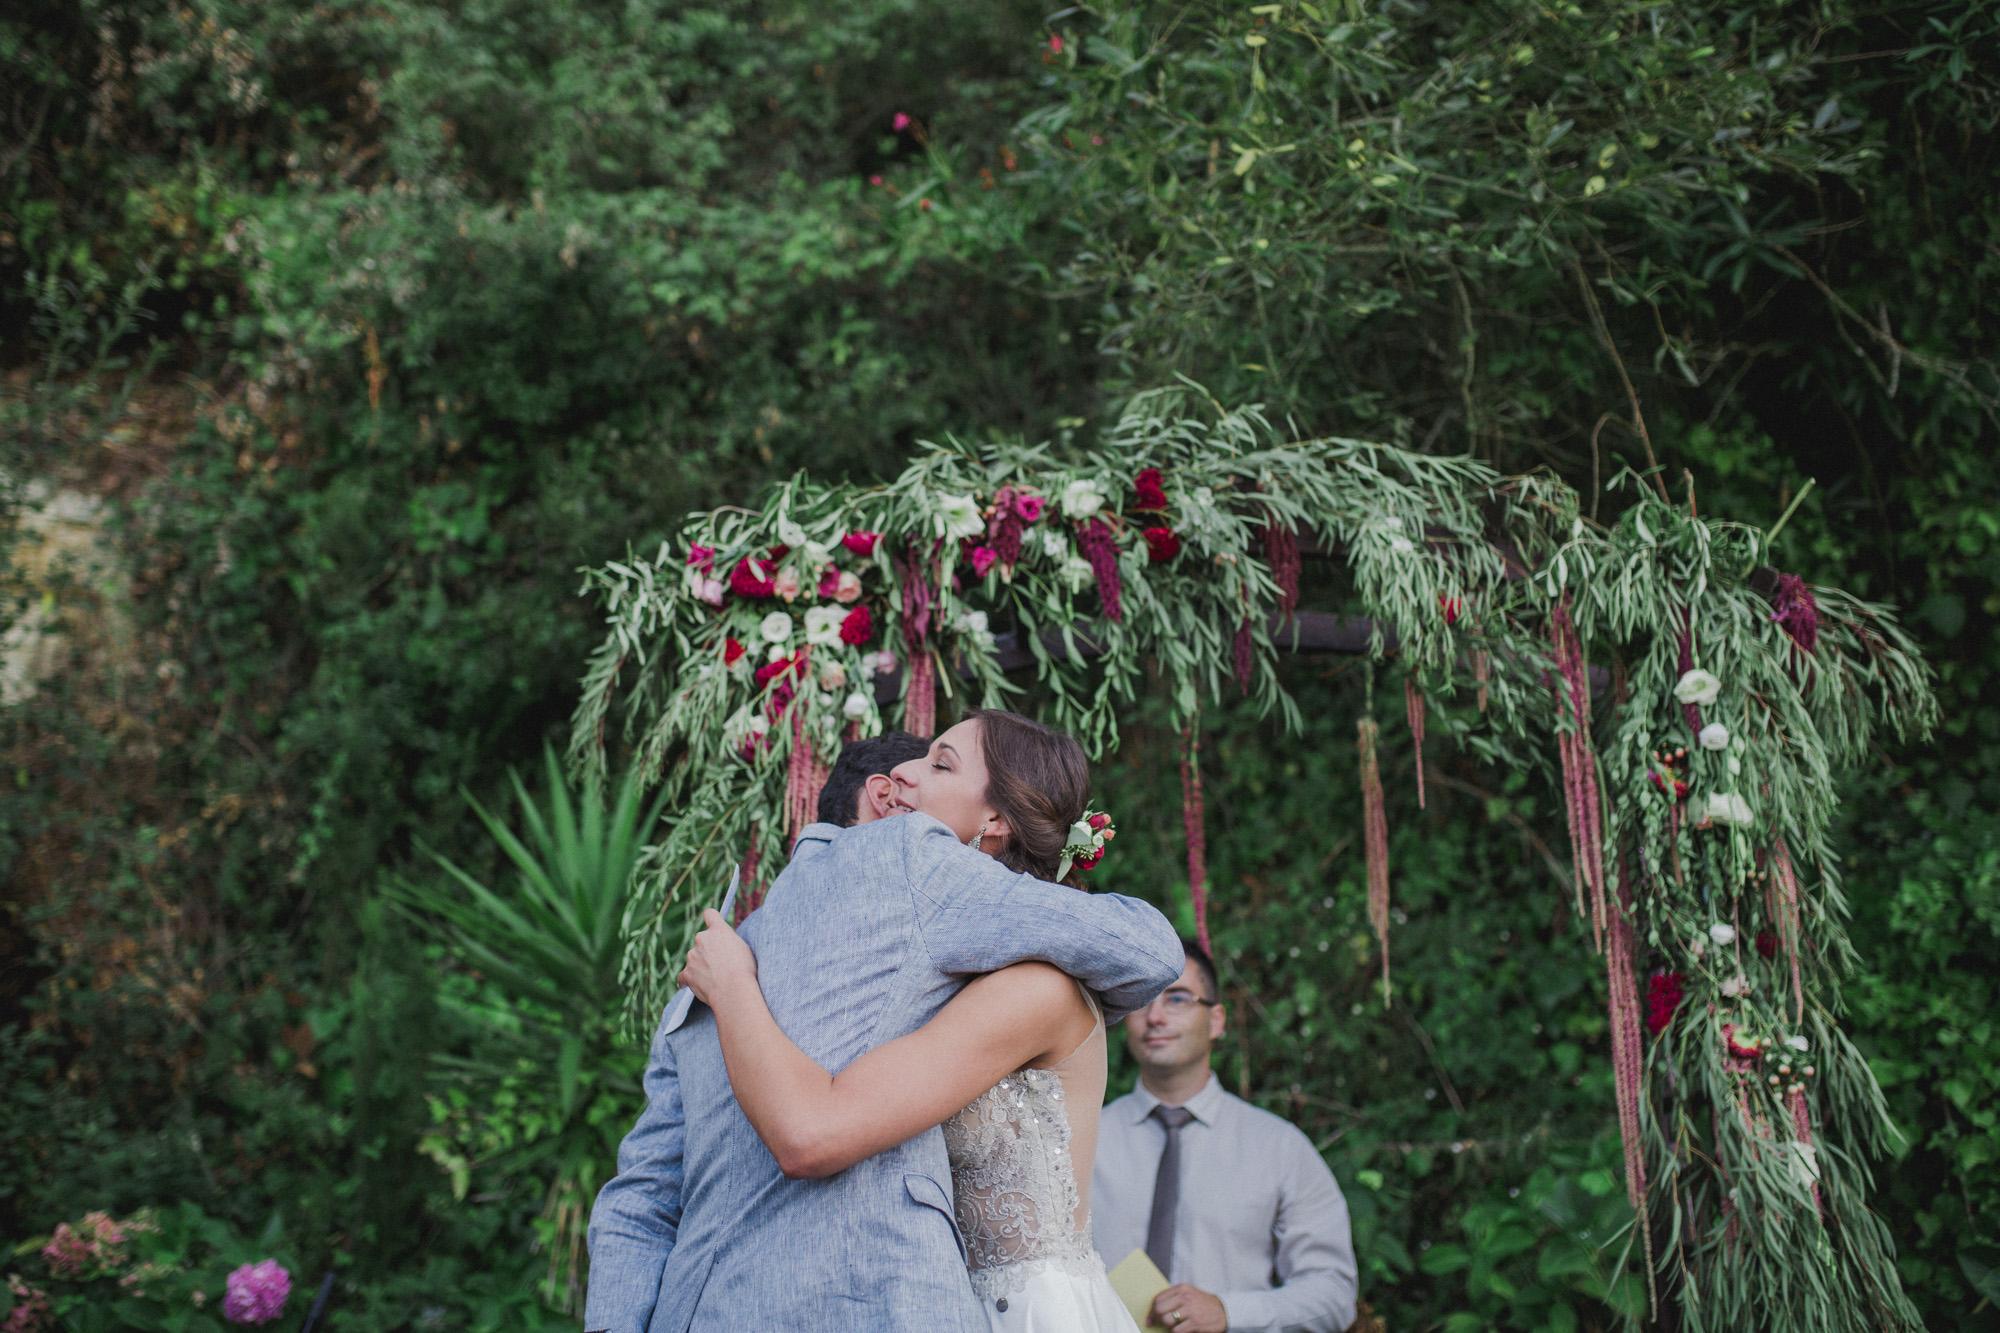 047-carina-e-samuel-wedding-casamento-quinta-dos-rouxinois-rustico-my-fancy-wedding-mafra-malveira-lisboa-sintra-cascais-filipe-santiago-fotografia-fotografo-lifestyle-destination-portugal